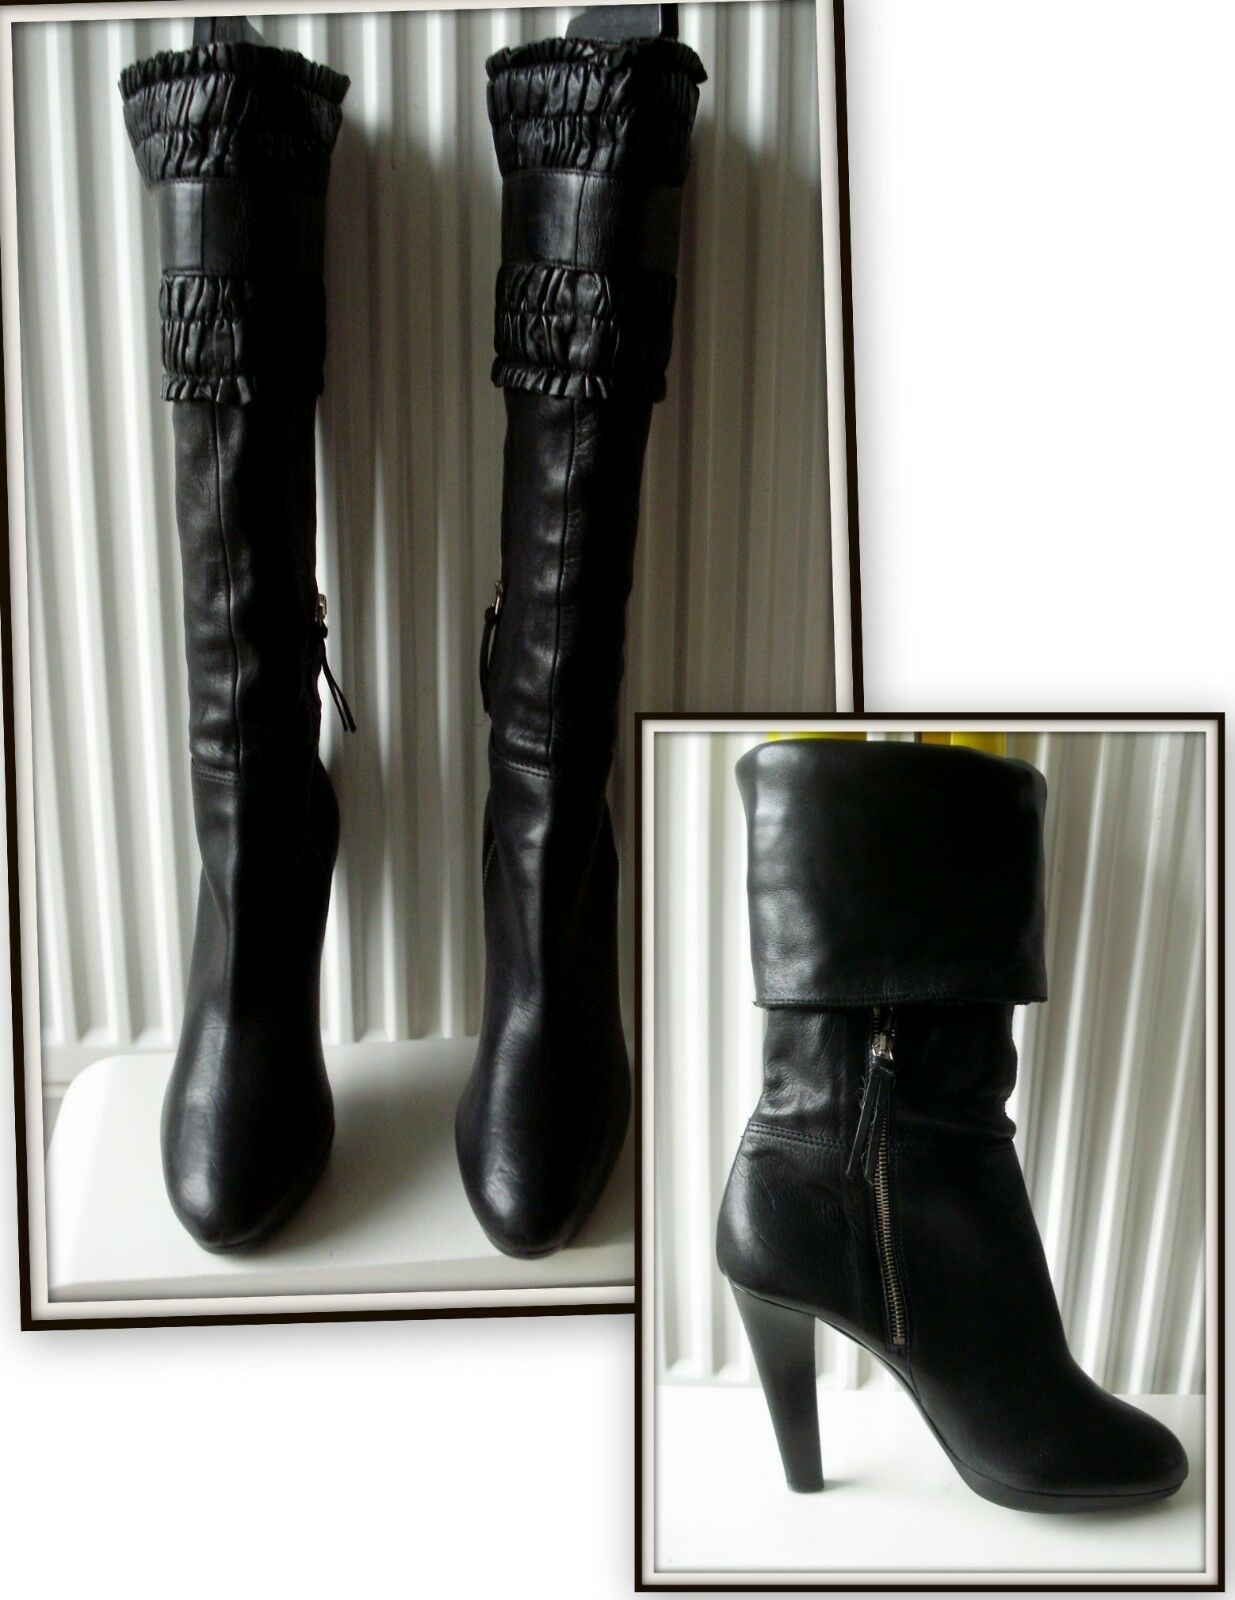 Bottines Bottes Miu Miu made Italie cuir noir 41 41 noir vintage Stiefel 0bdf92